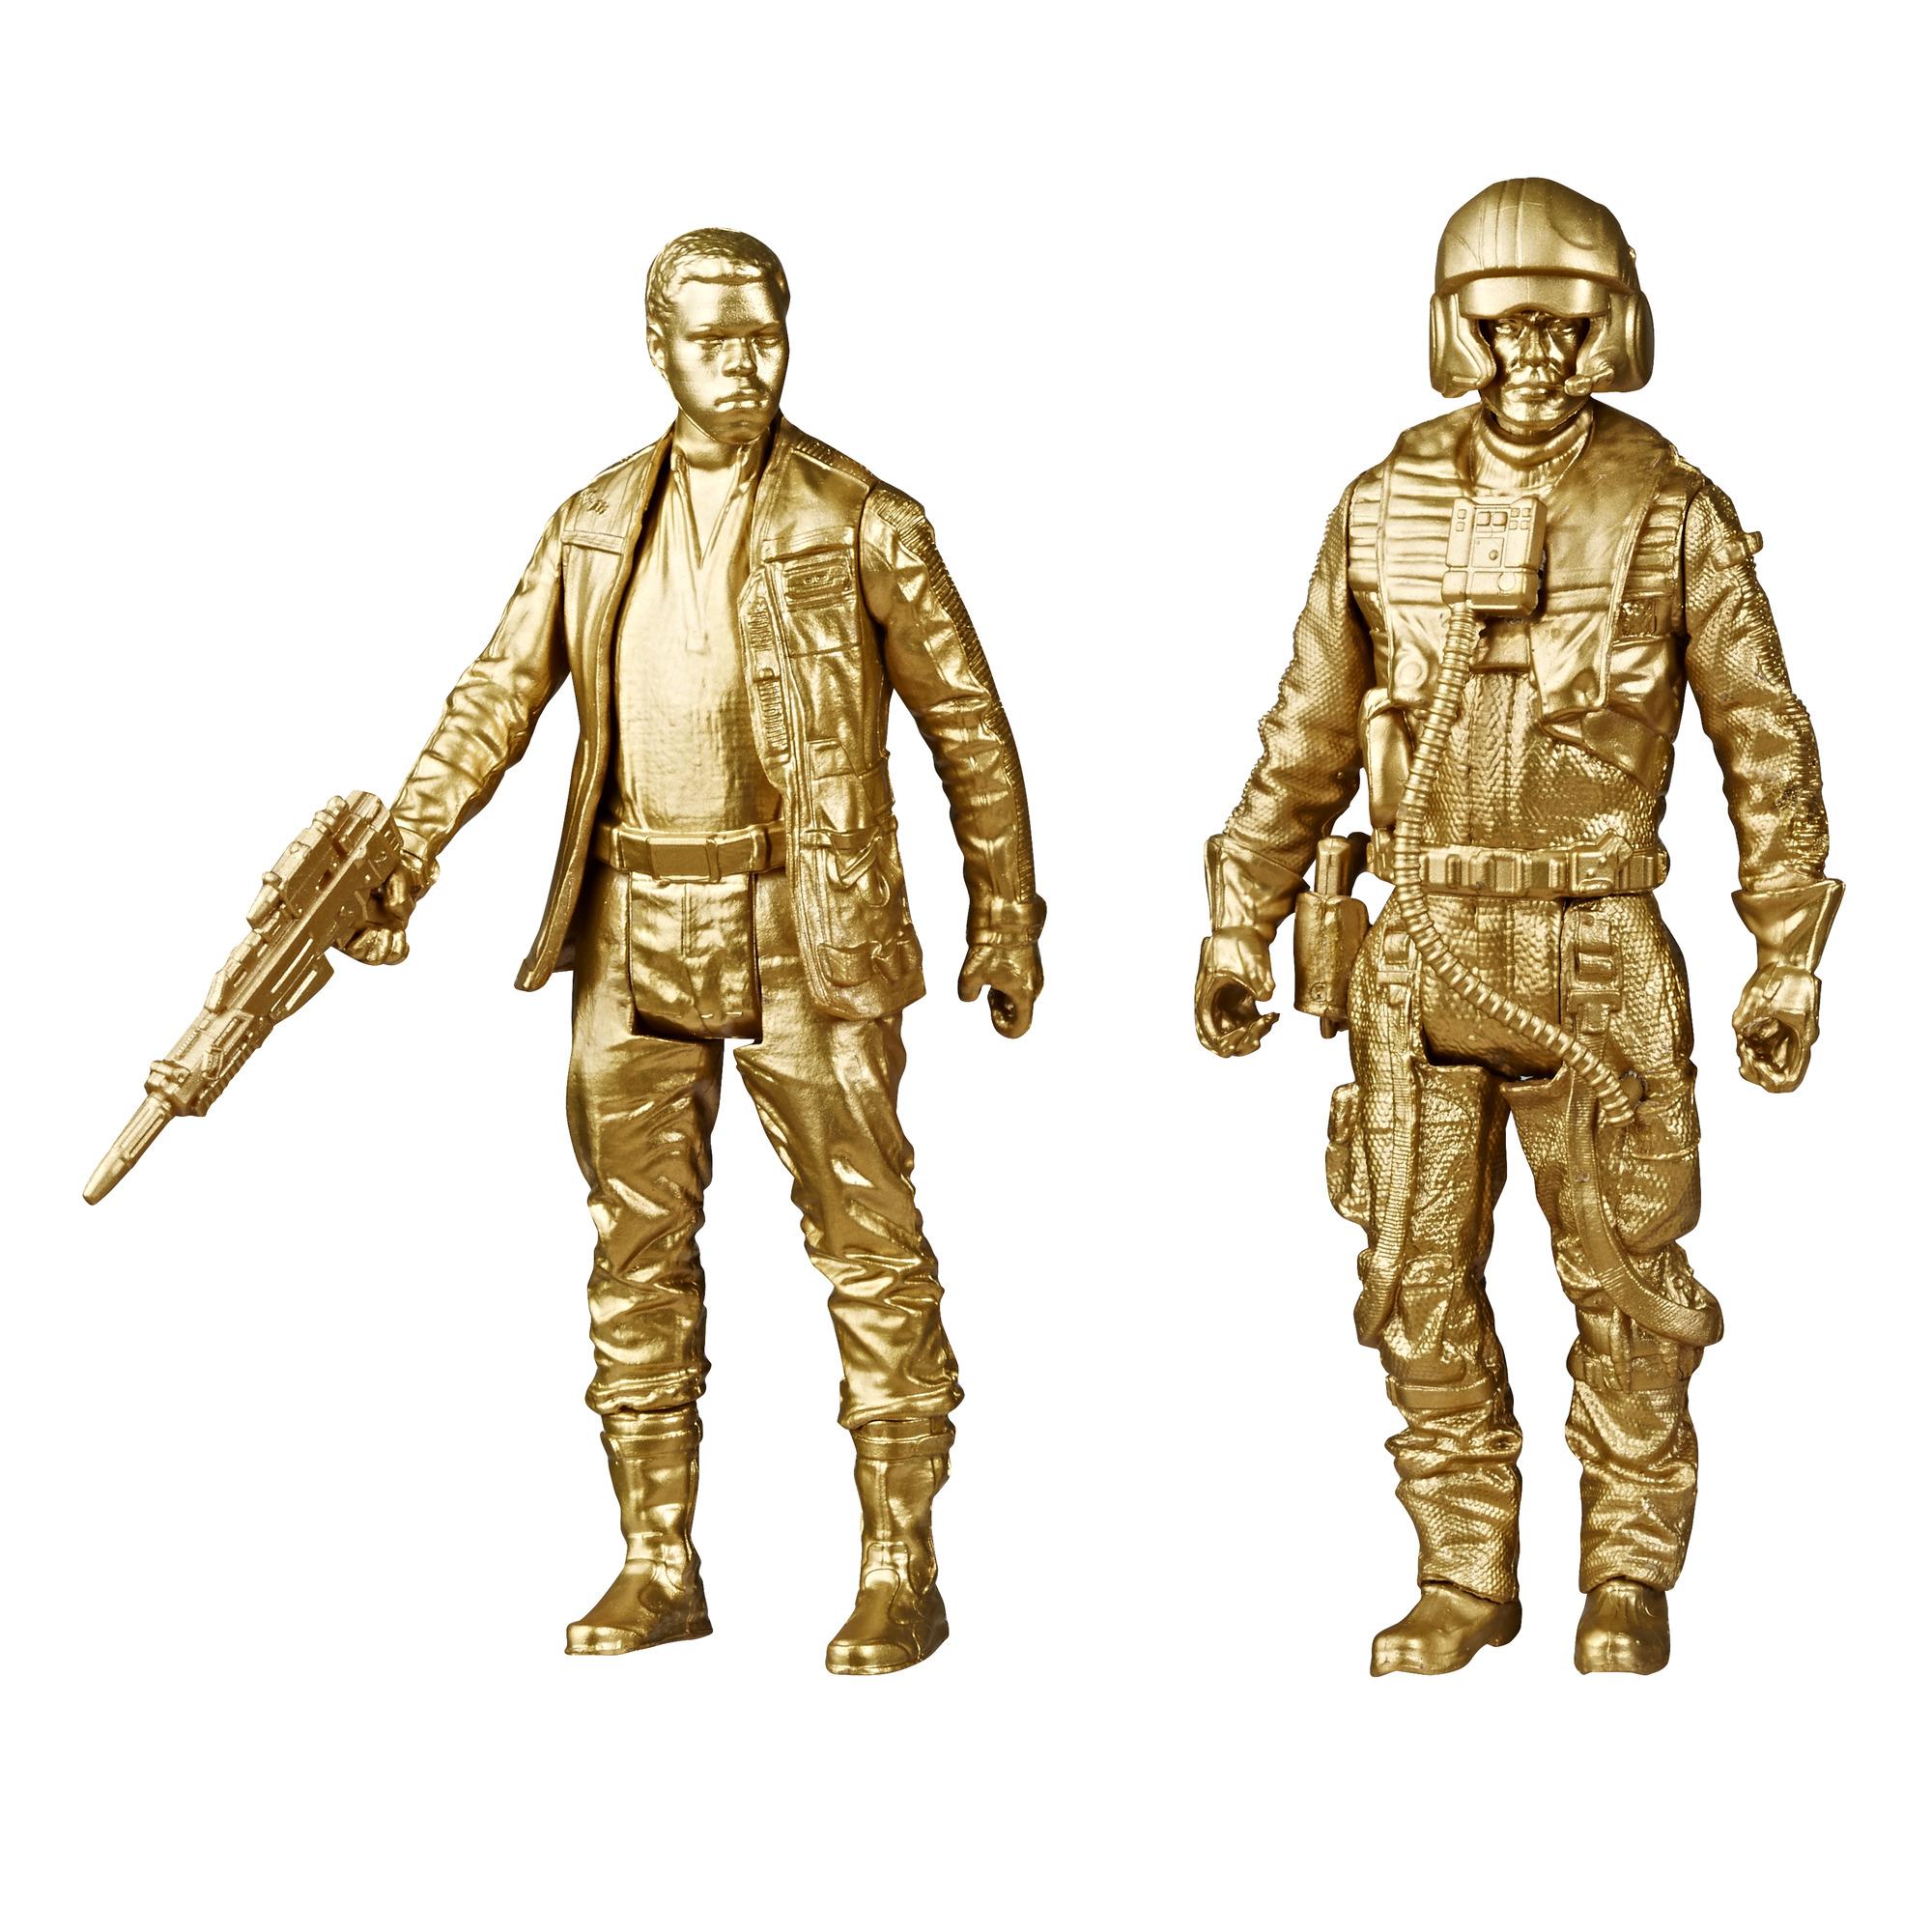 "2-Pack Star Wars Skywalker Saga 3.75"" Gold Figures: Finn & Poe $4.95, Kylo & Rey $5.25 + Free Shipping w/ Walmart+ or Orders $35+"